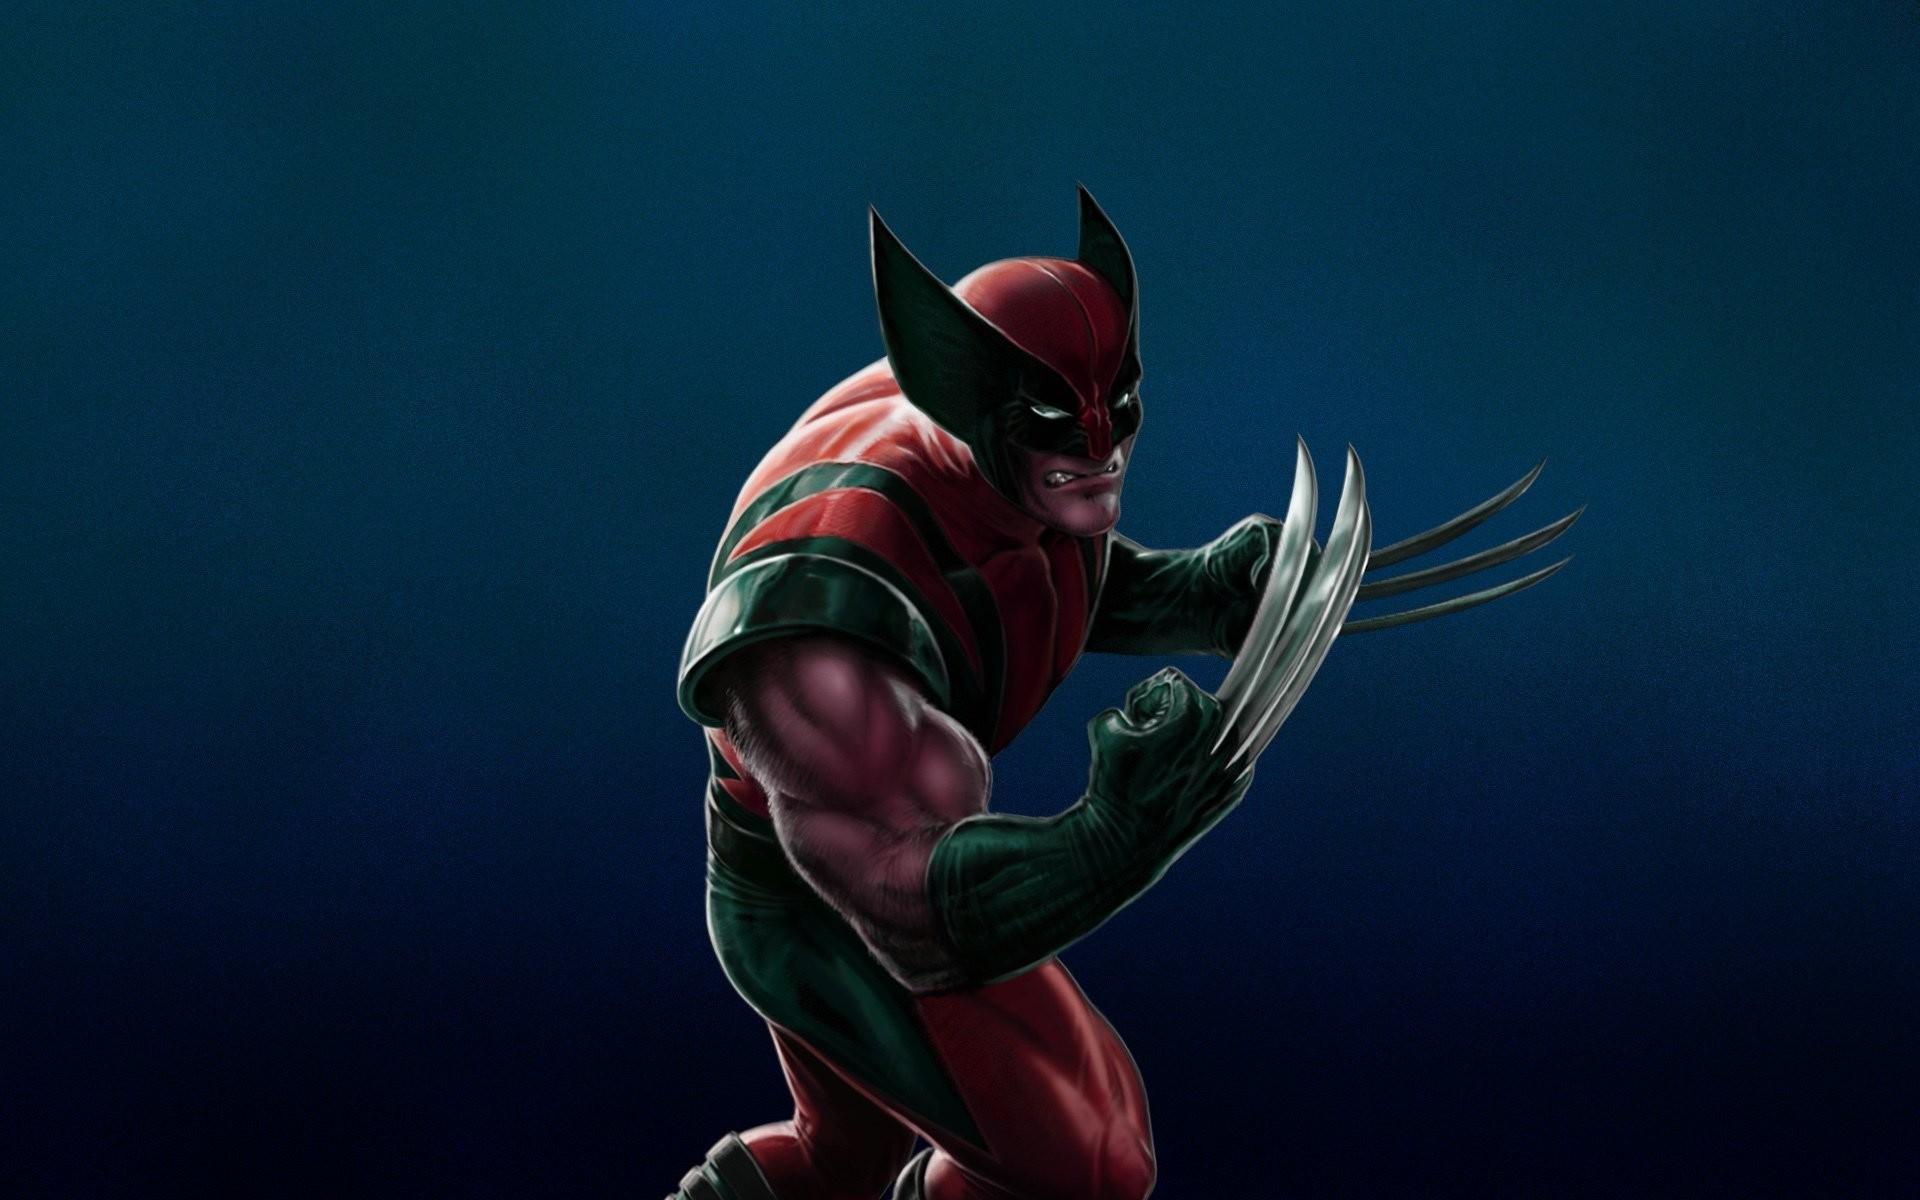 Wallpaper Wolverine X Men 68 Images